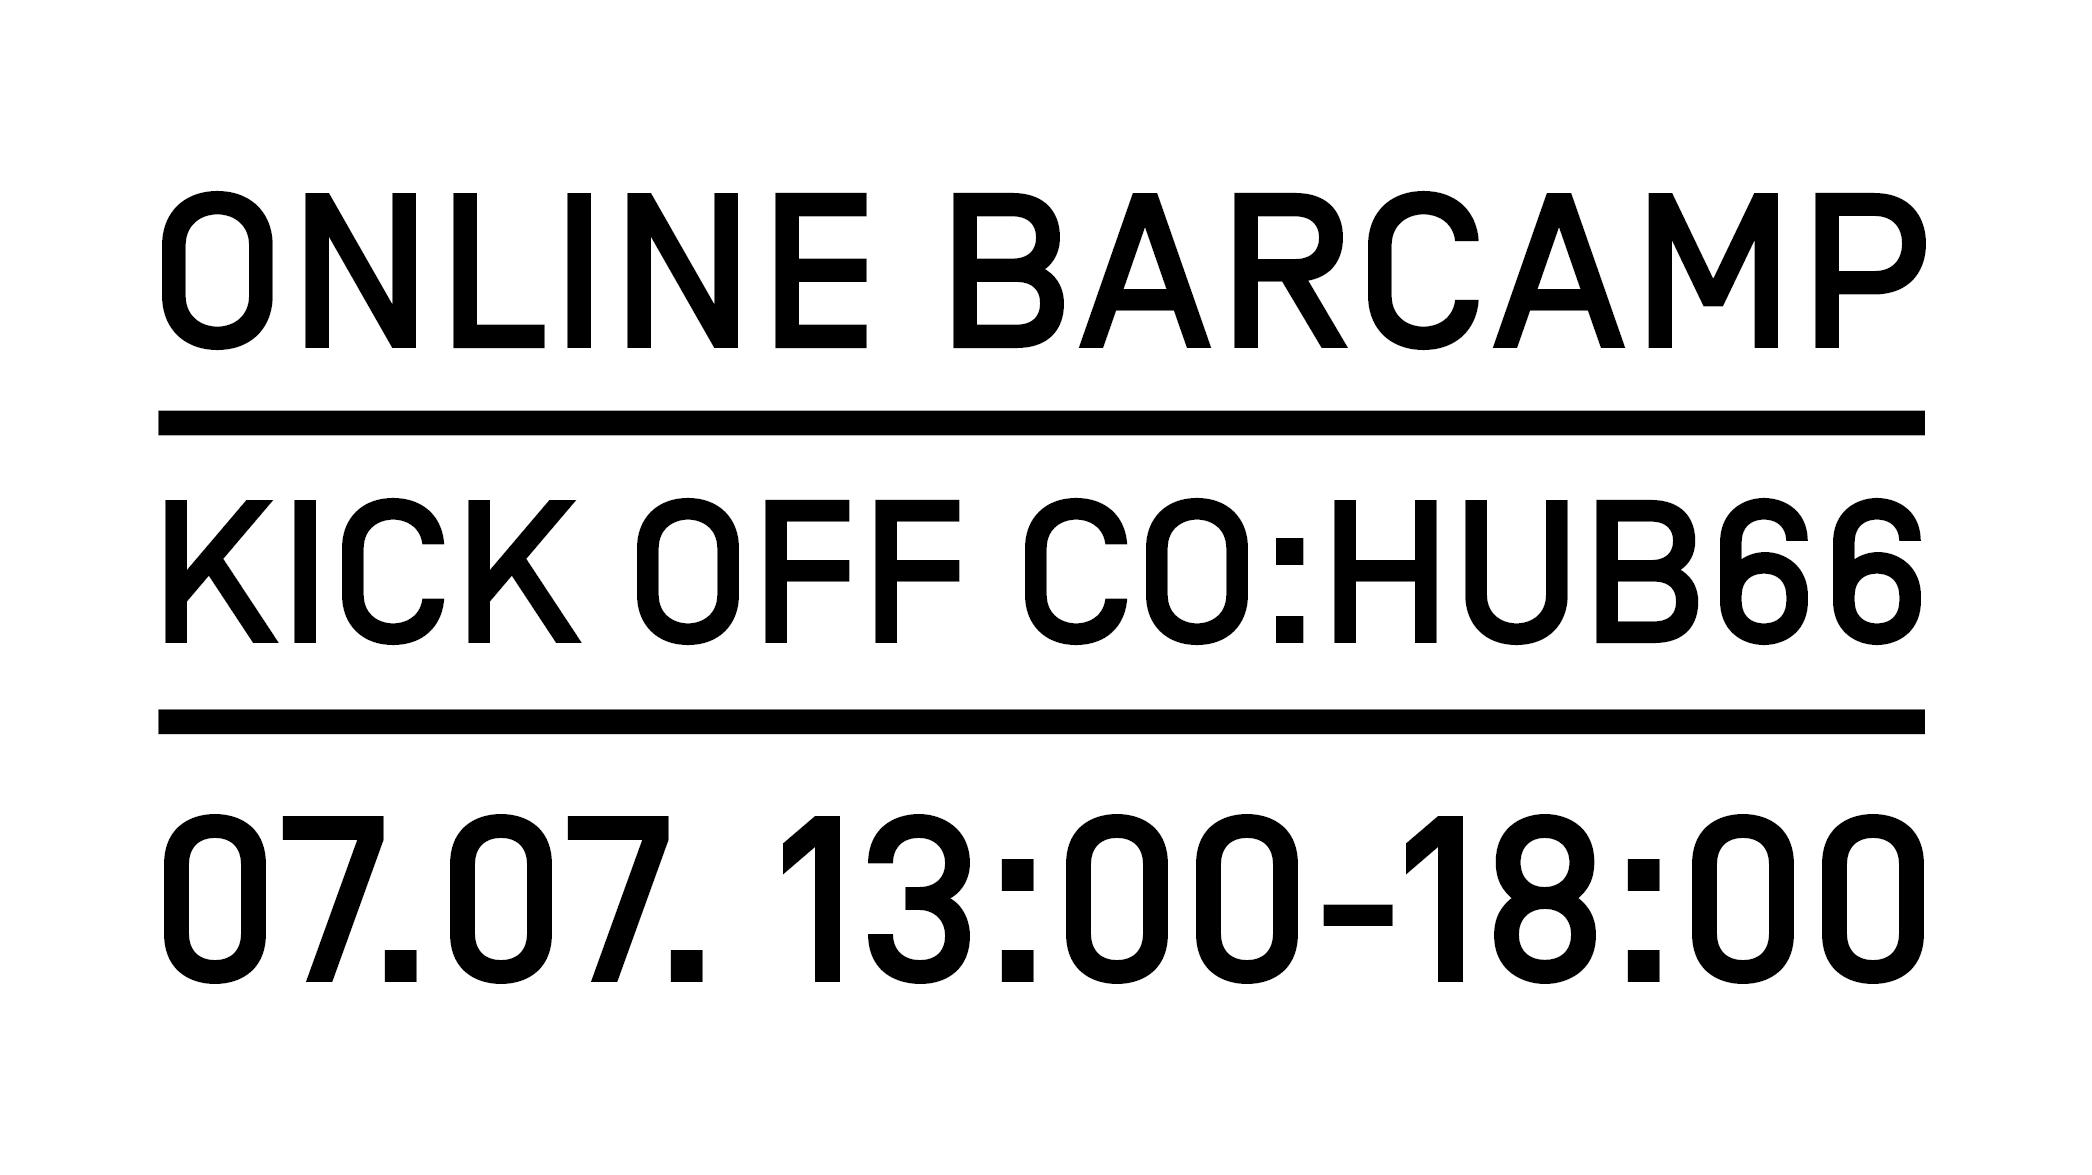 Online Barcamp